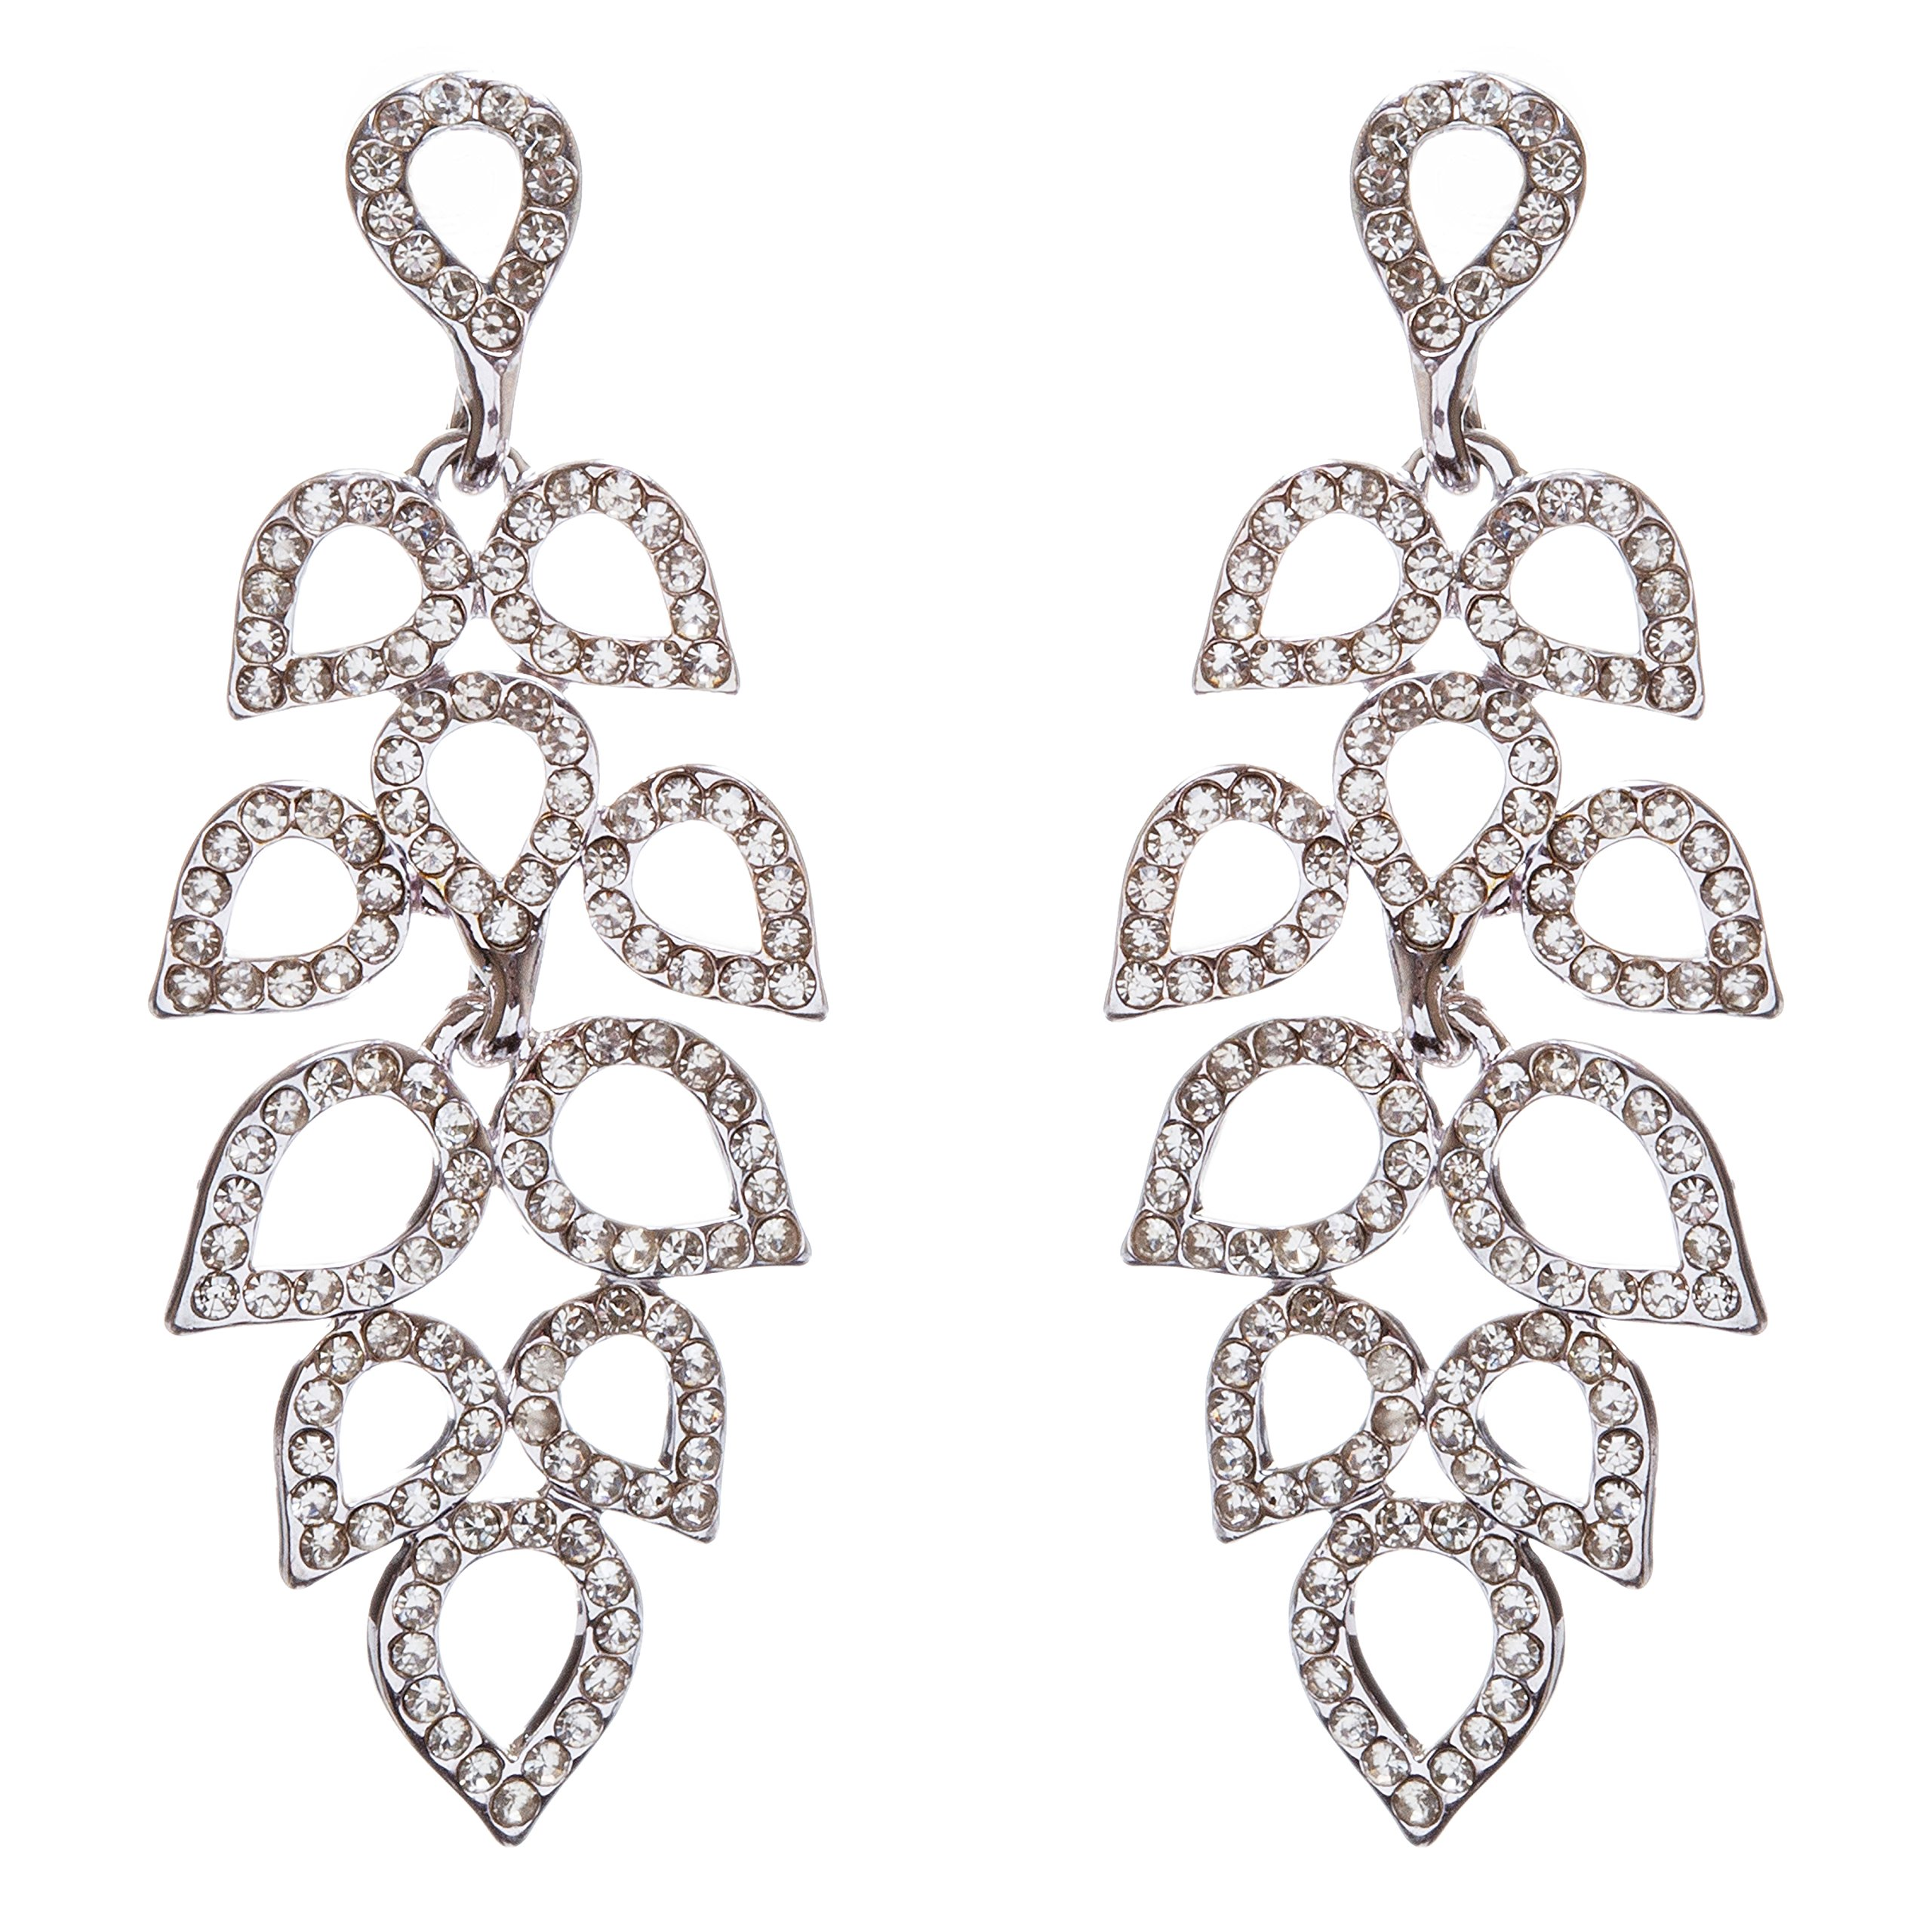 ACCESSORIESFOREVER Women Bridal Wedding Jewelry Prom Crystal Rhinestone Dazzling Dangle Earrings E960 SV